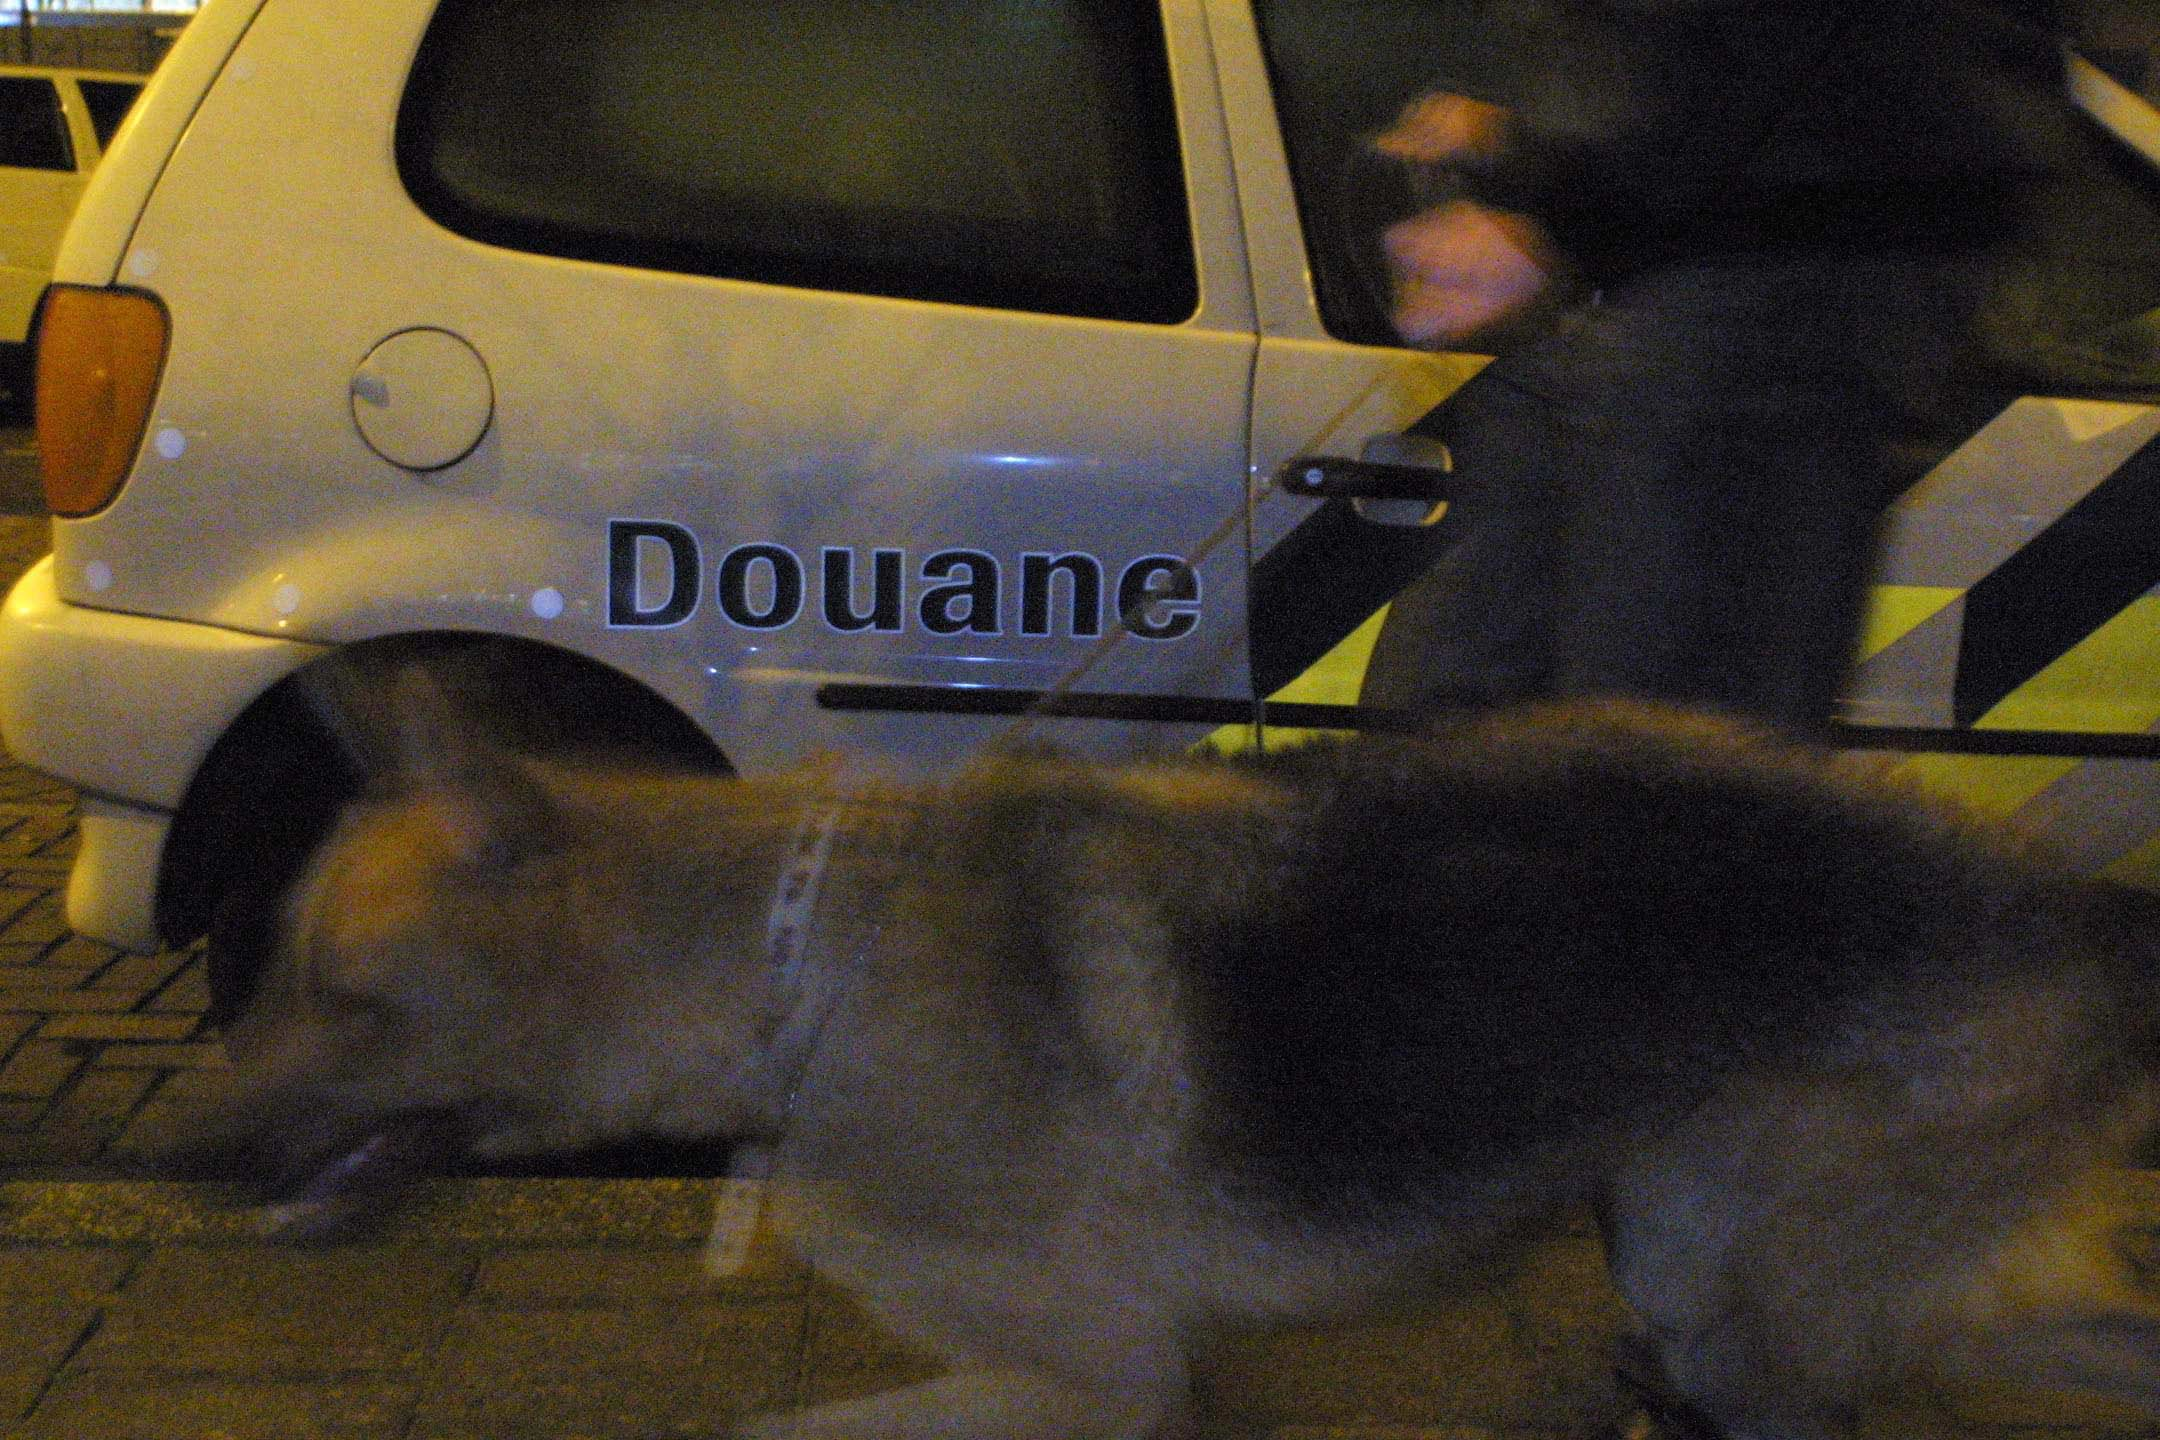 Douane vindt 65 kilo cocaïne tussen kamerplanten